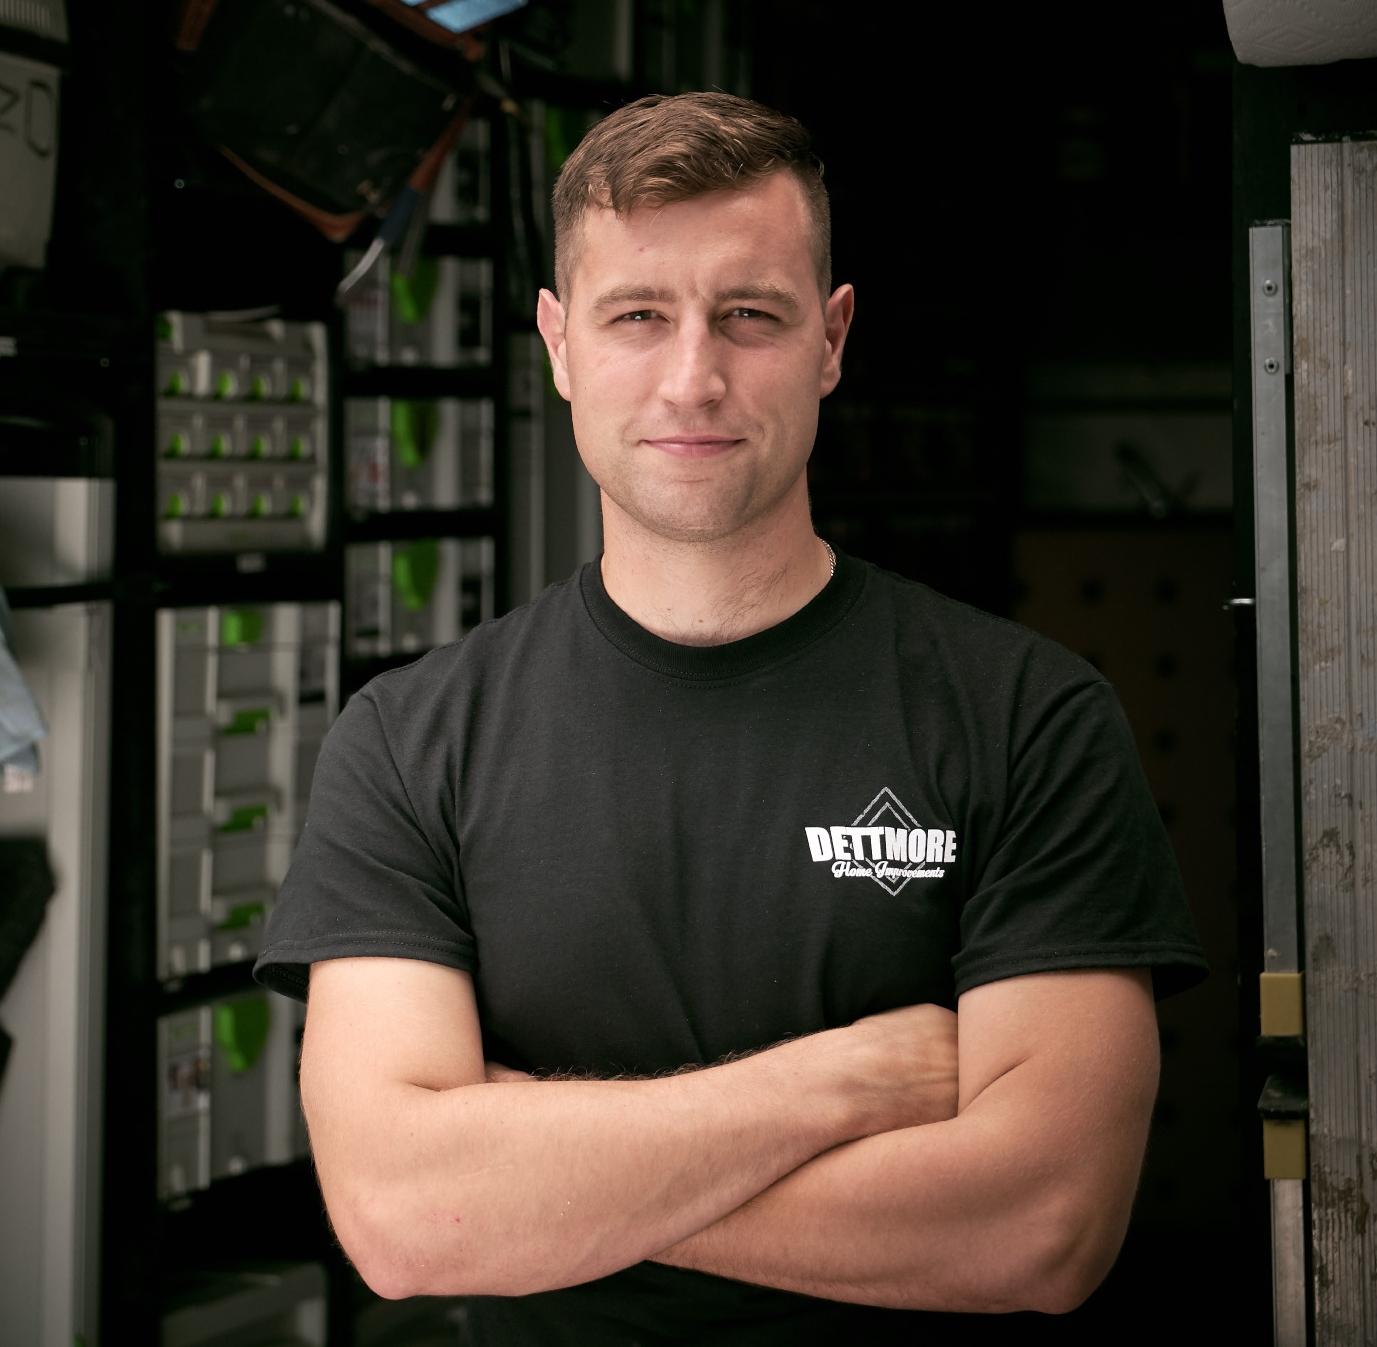 Zachary Dettmore - Founder